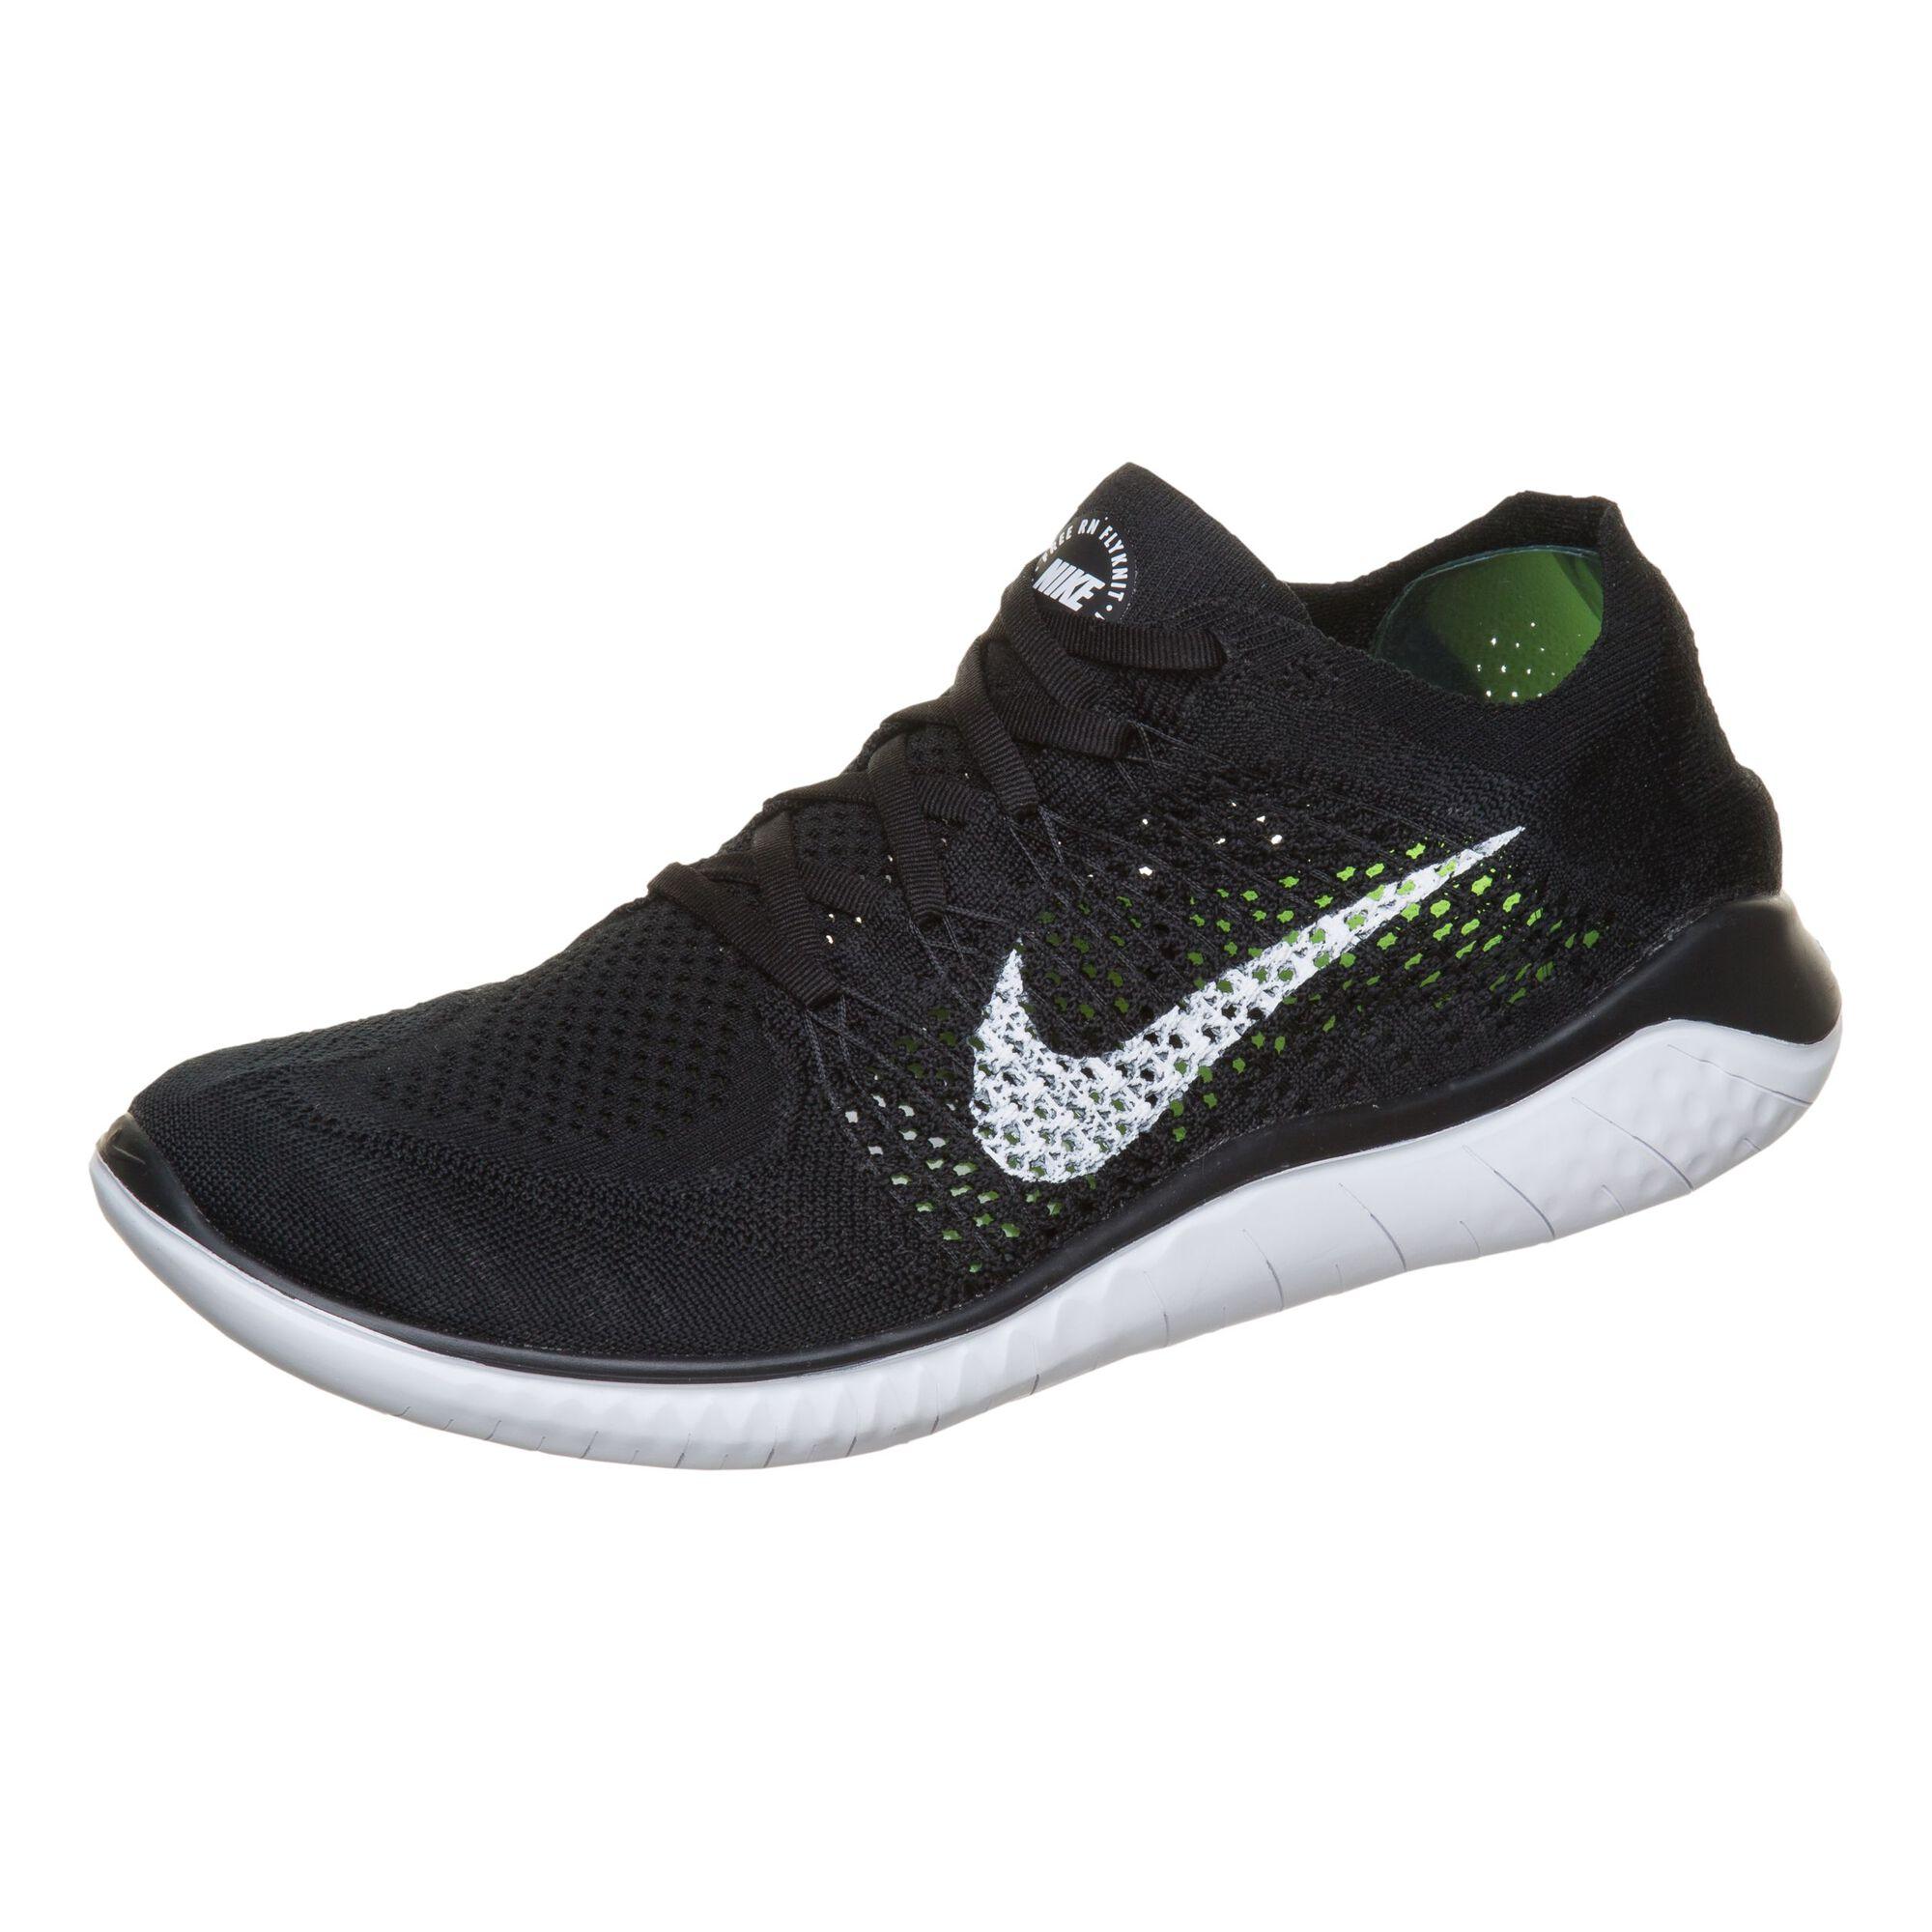 promo code 45607 524df Nike Free Run Flyknit 2018 Natural-Running Schuh Herren - Schwarz ...